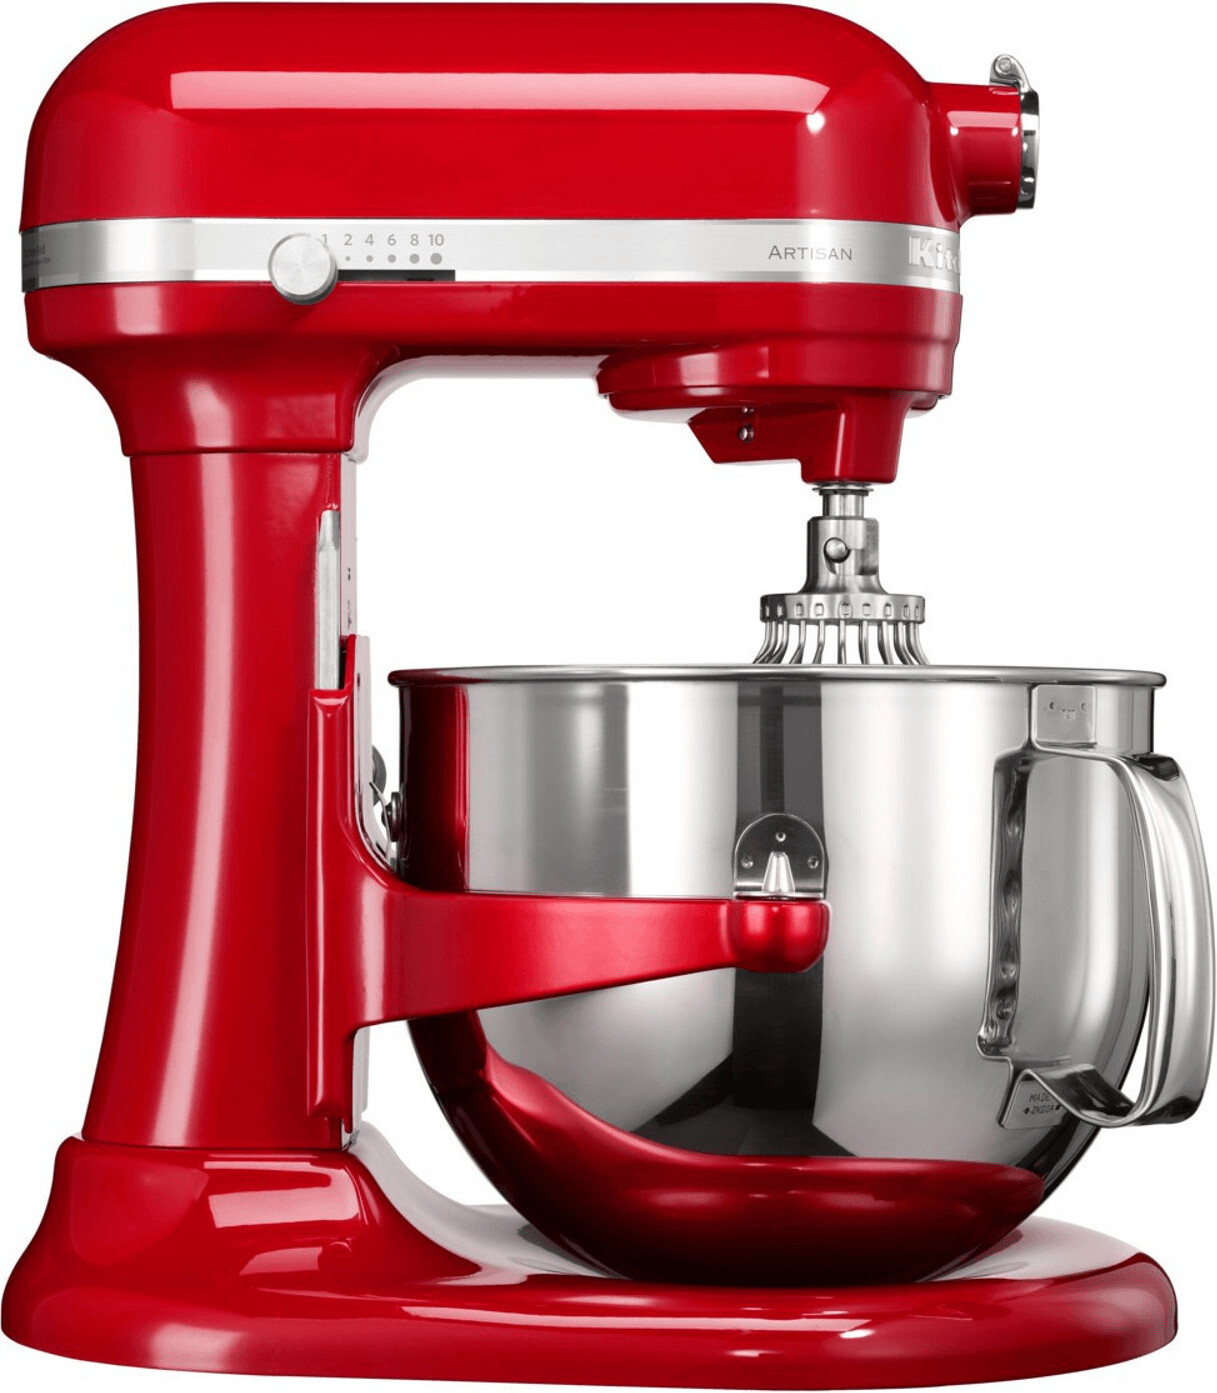 Image of KitchenAid Artisan Robot da cucina 6,9 L